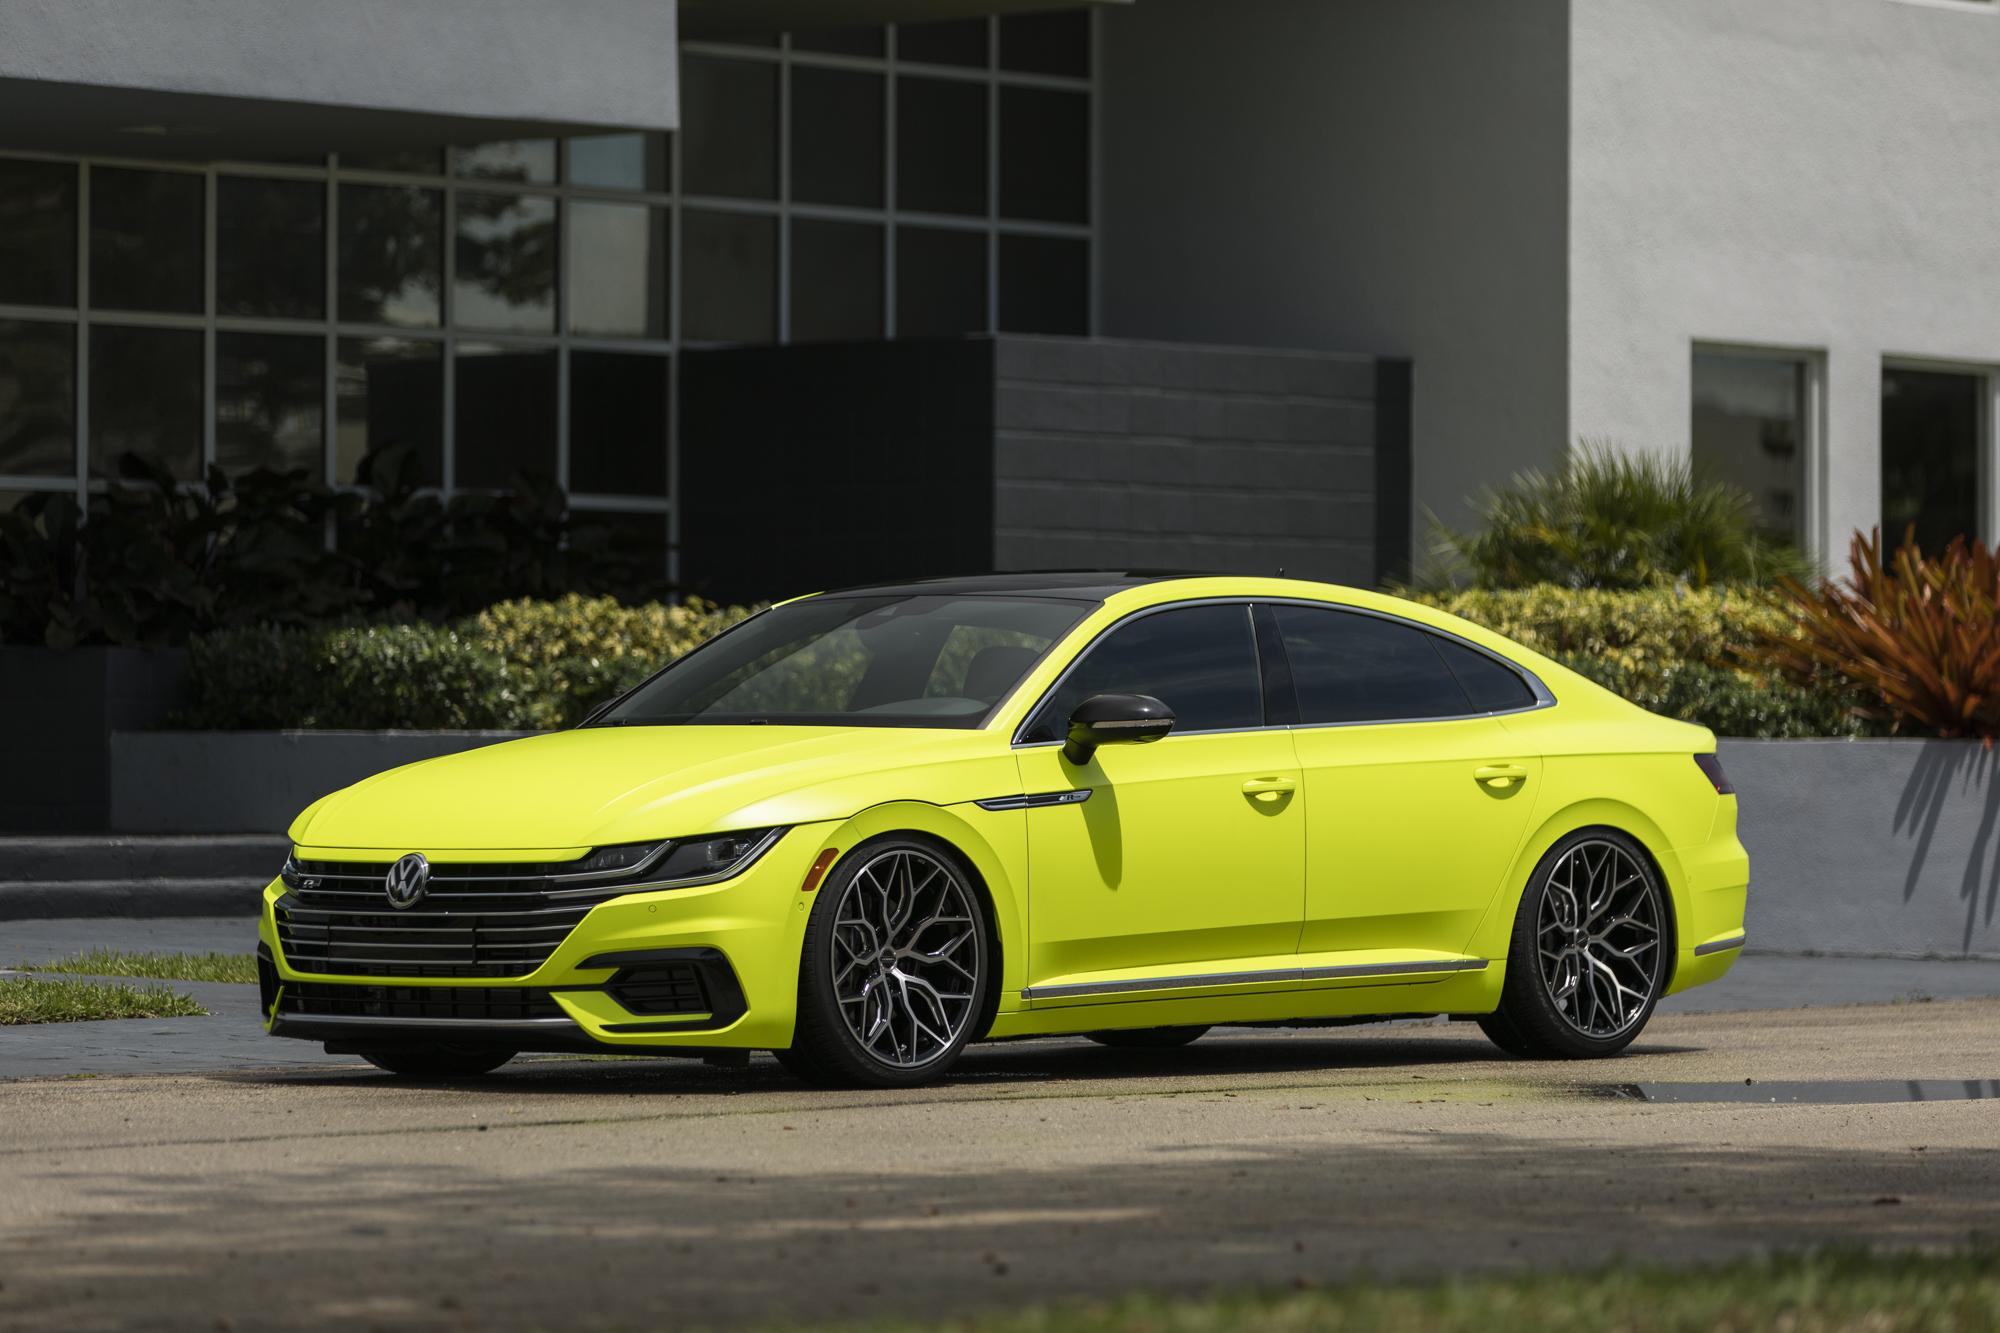 volkswagen bringing enthusiast focused concepts   car shows